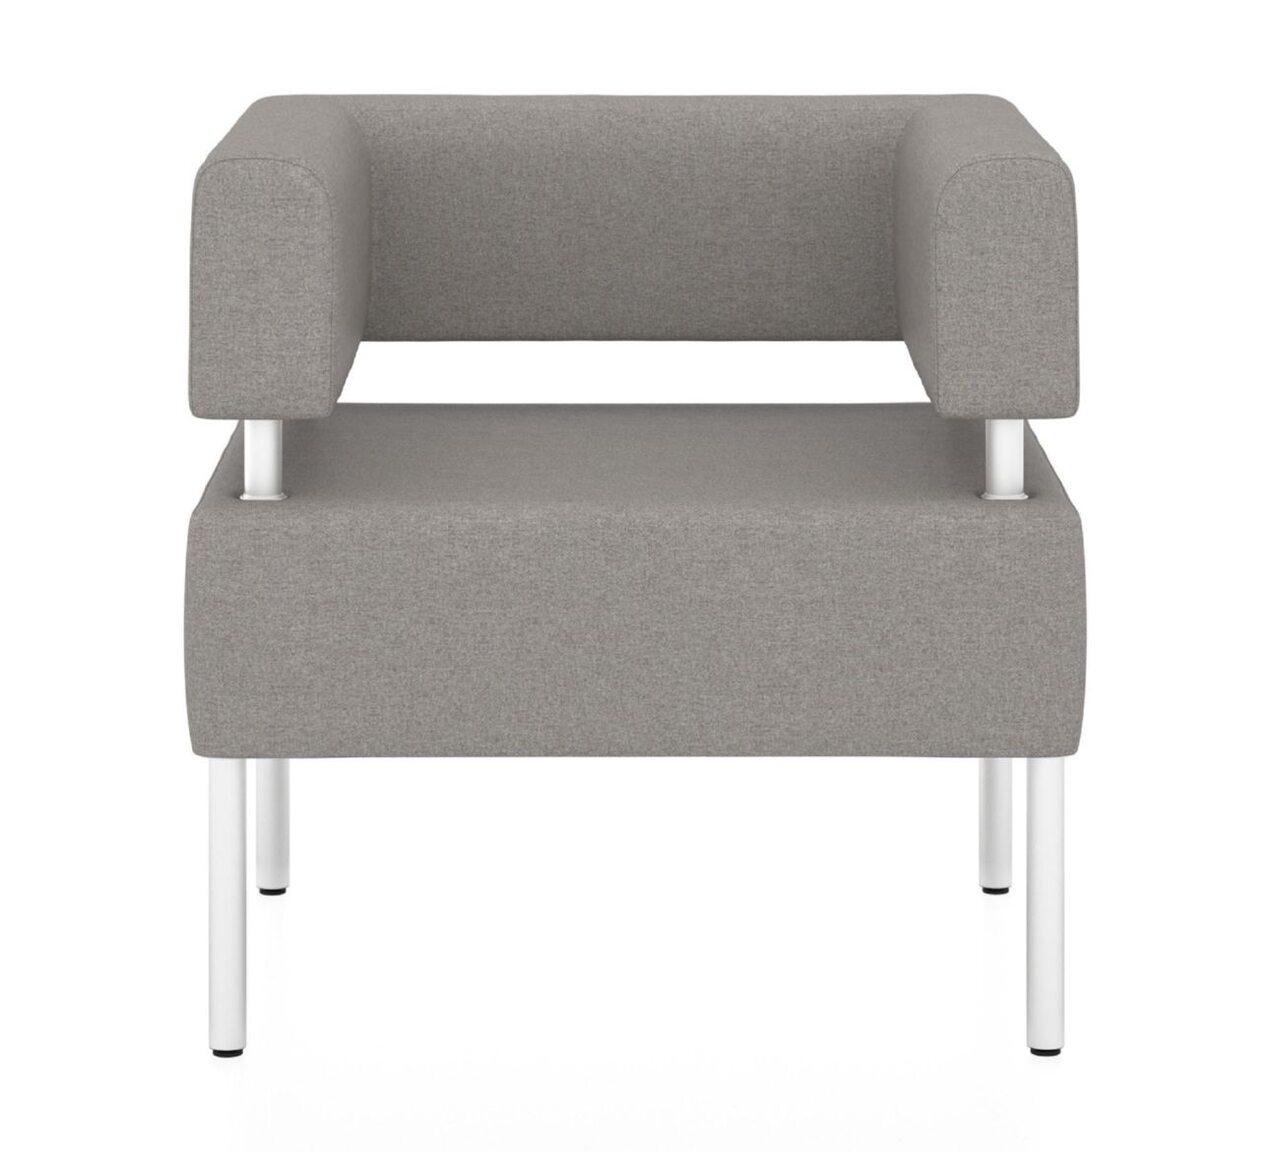 Кресло  МС 74x63x80 - фото 2